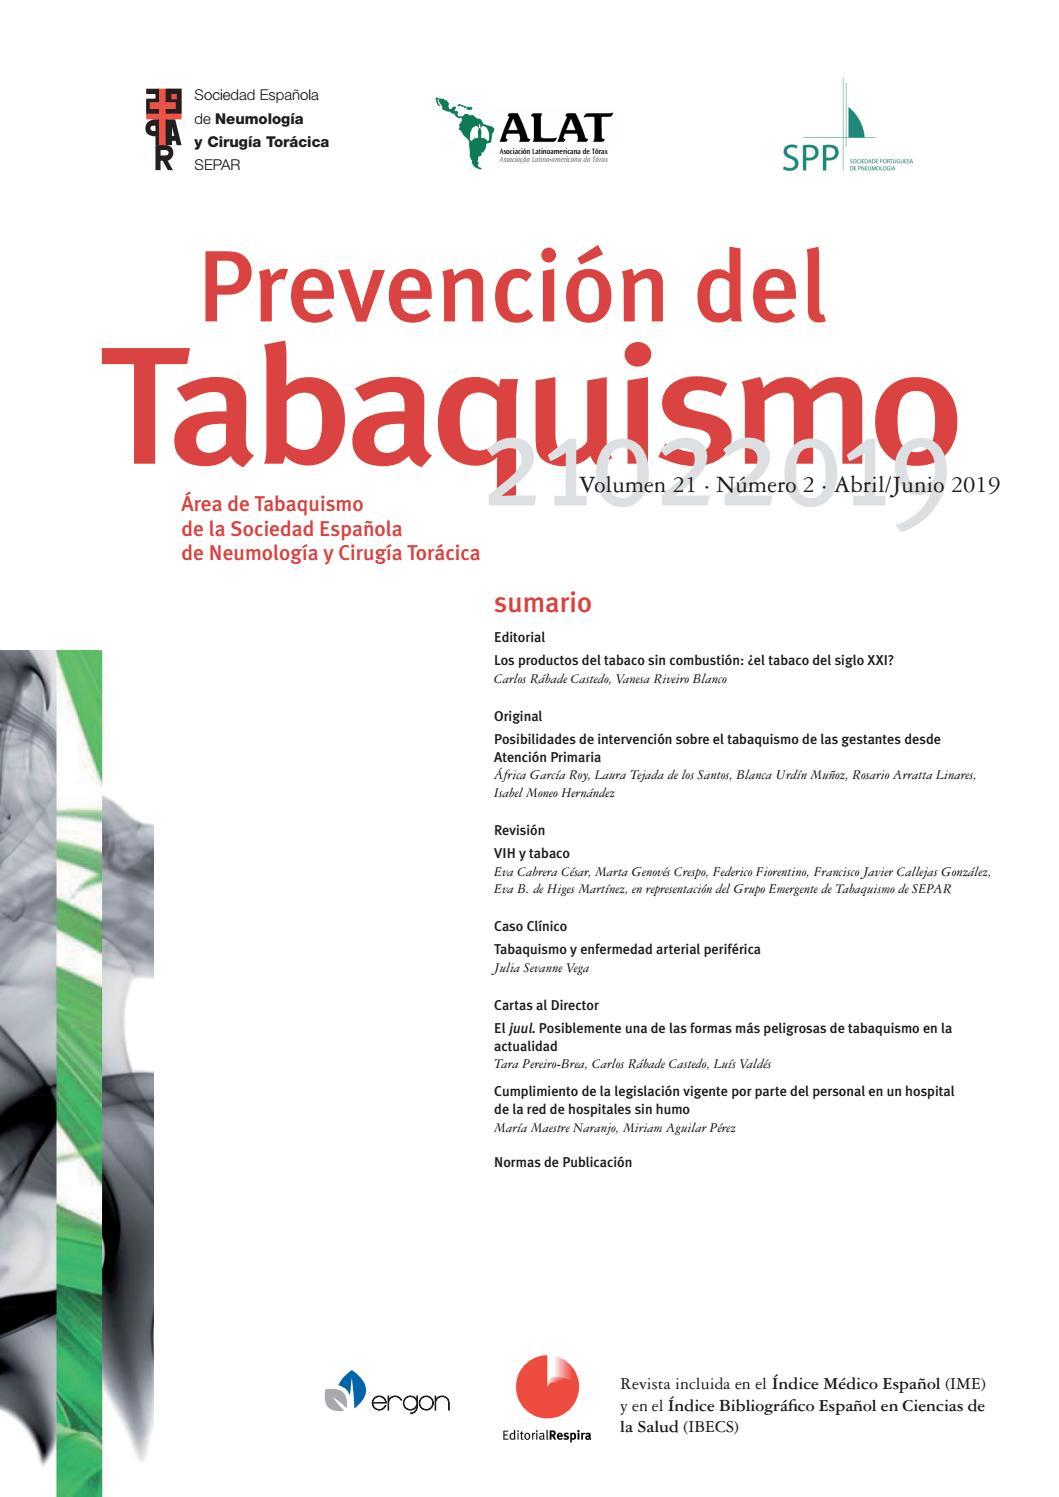 Akute intermittierende pórfido síntomas de diabetes